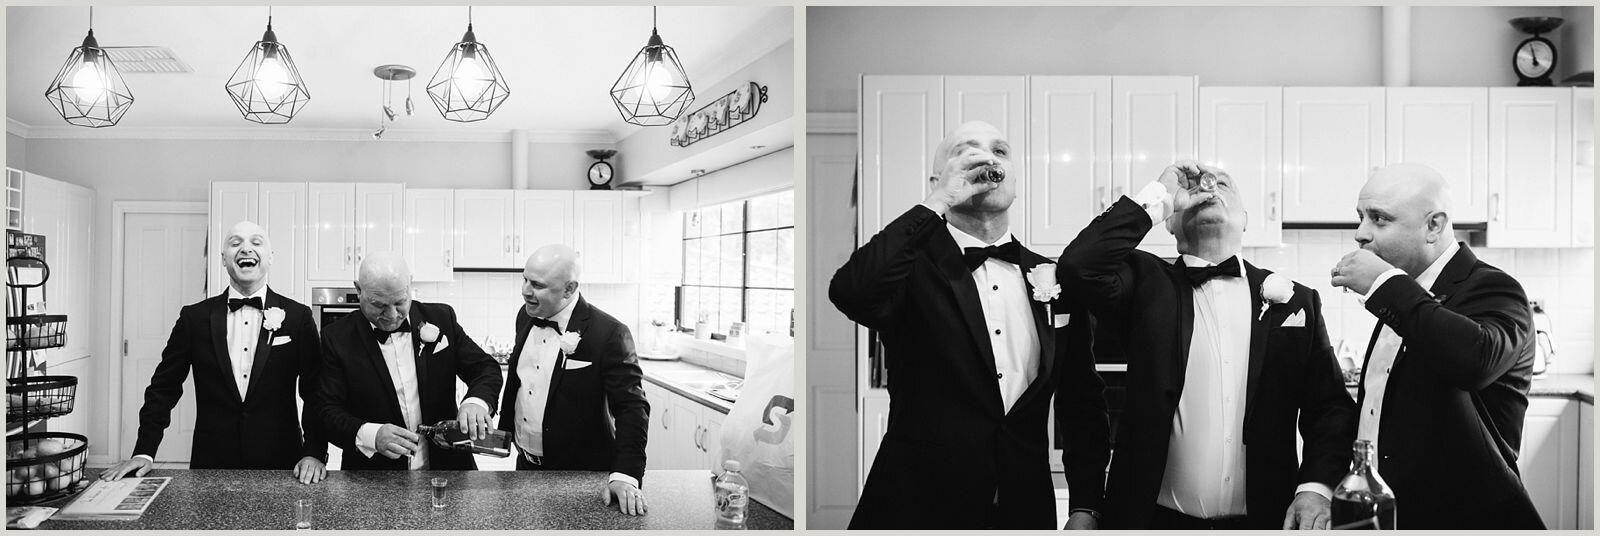 joseph_koprek_wedding_melbourne_the_prince_deck_0004.jpg